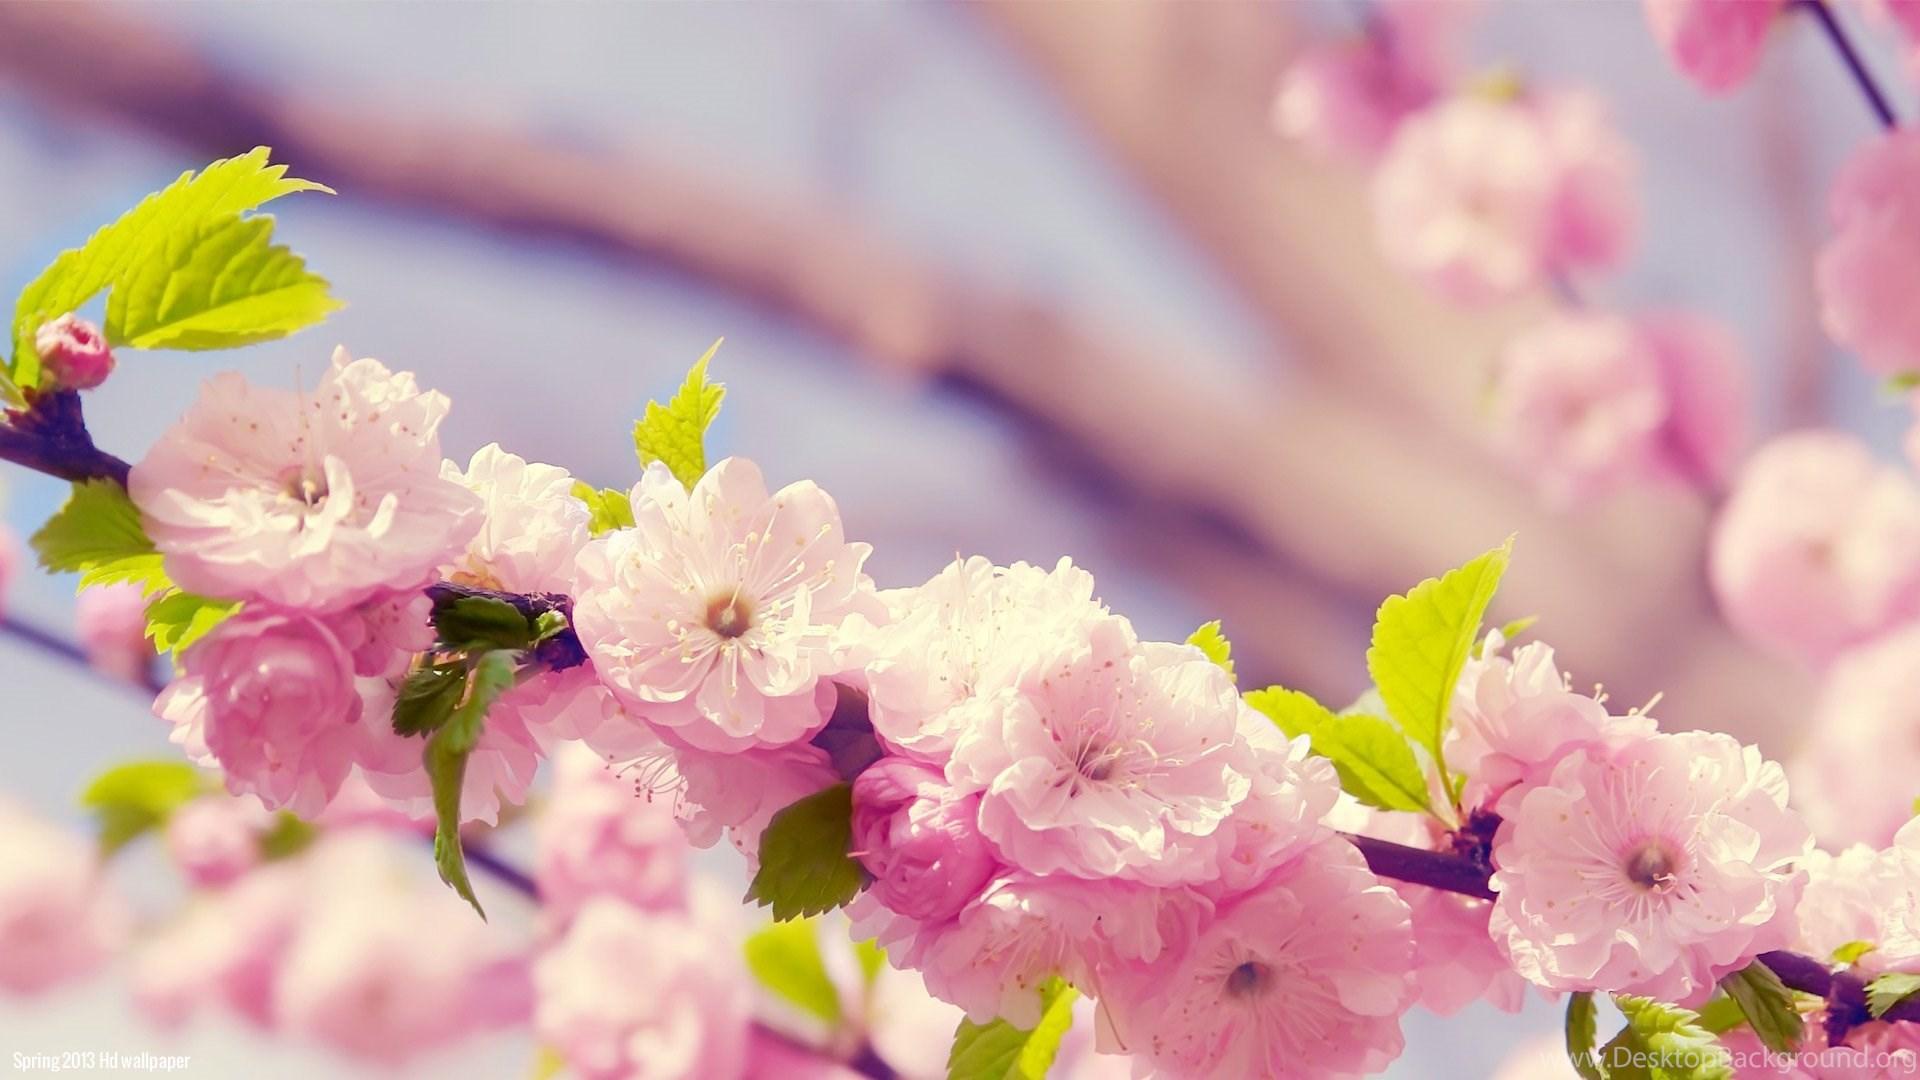 Spring Flowers Desktop Backgrounds Widescreen Pictures Www